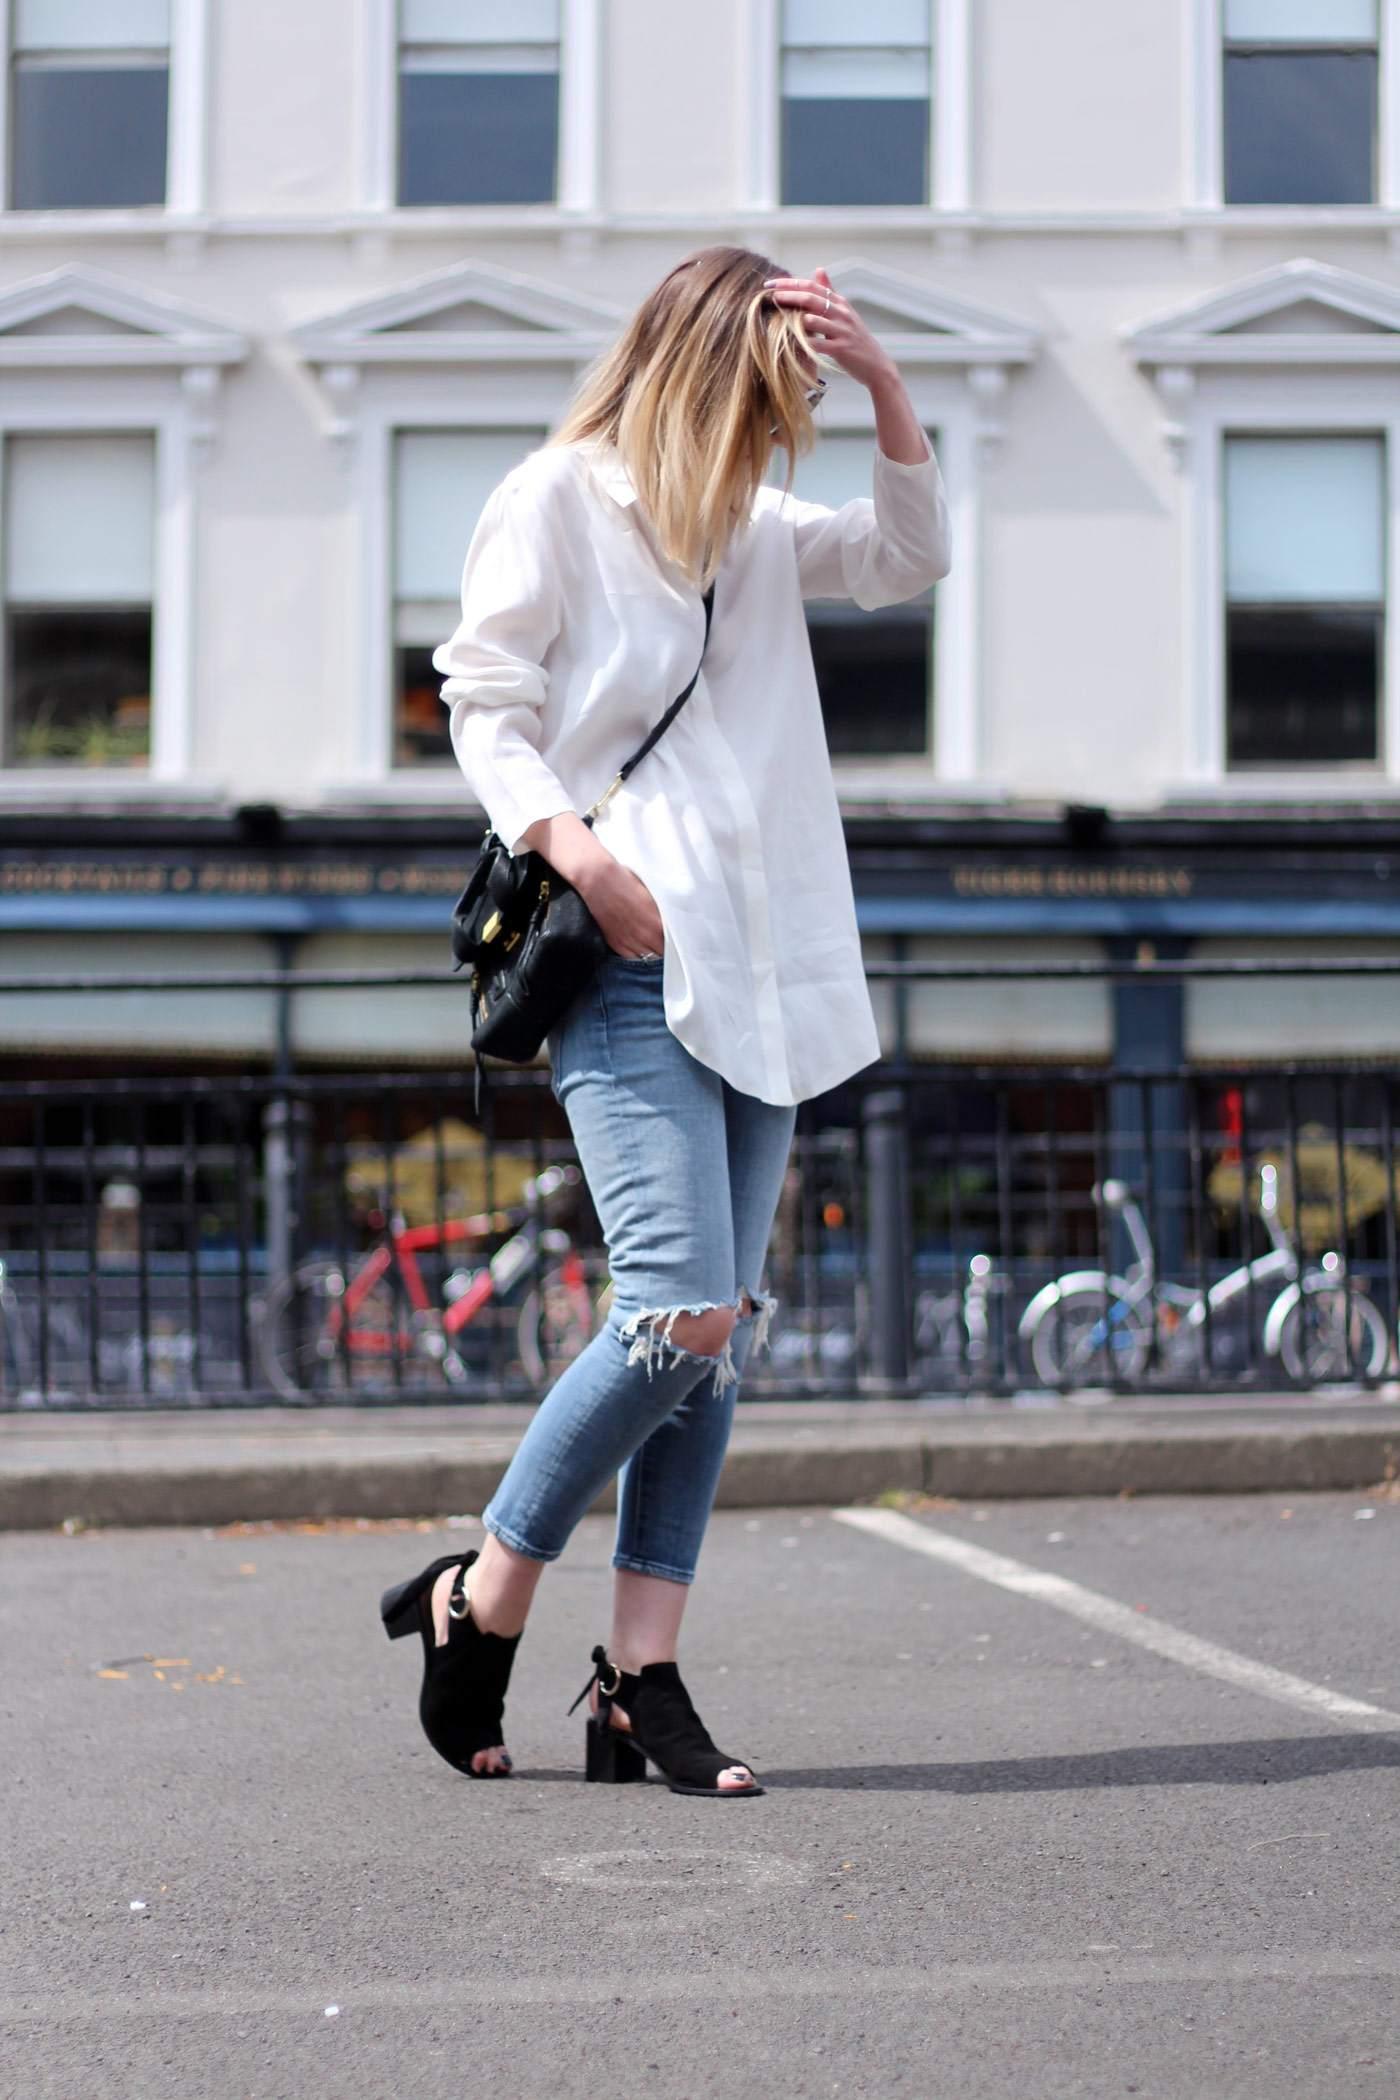 kurt-geiger-suede-peep-toe-boots-7FAM-jeans-COS-white-shirt-phillip-lim-pashli-mini-5